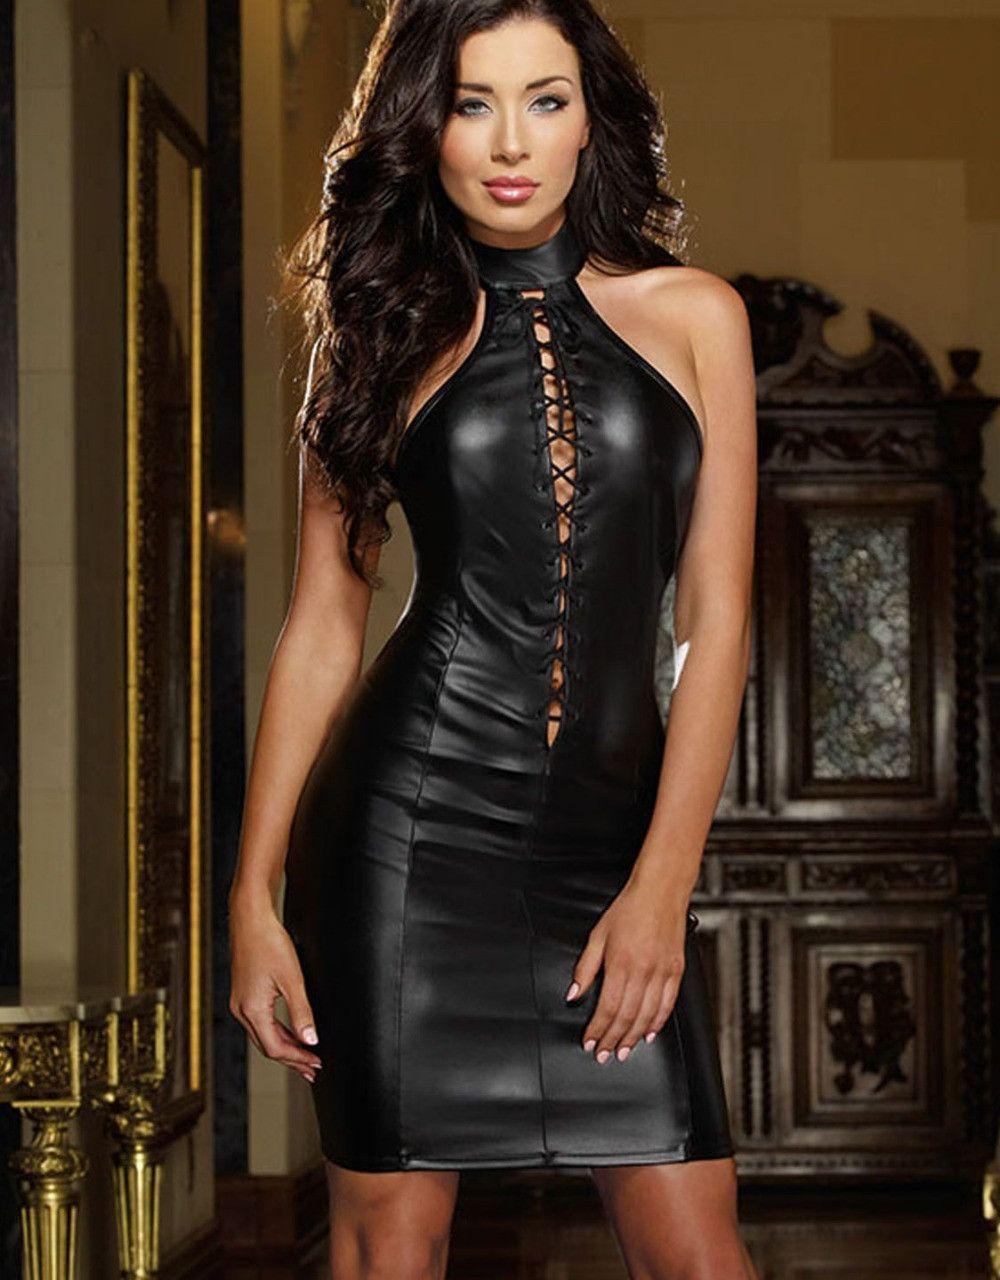 74f3cac1376 Sexy Leather Dress Price Fashion Black Women Club Dress High Quality Vinyl  Mini Sexy Halter Dresses 6301